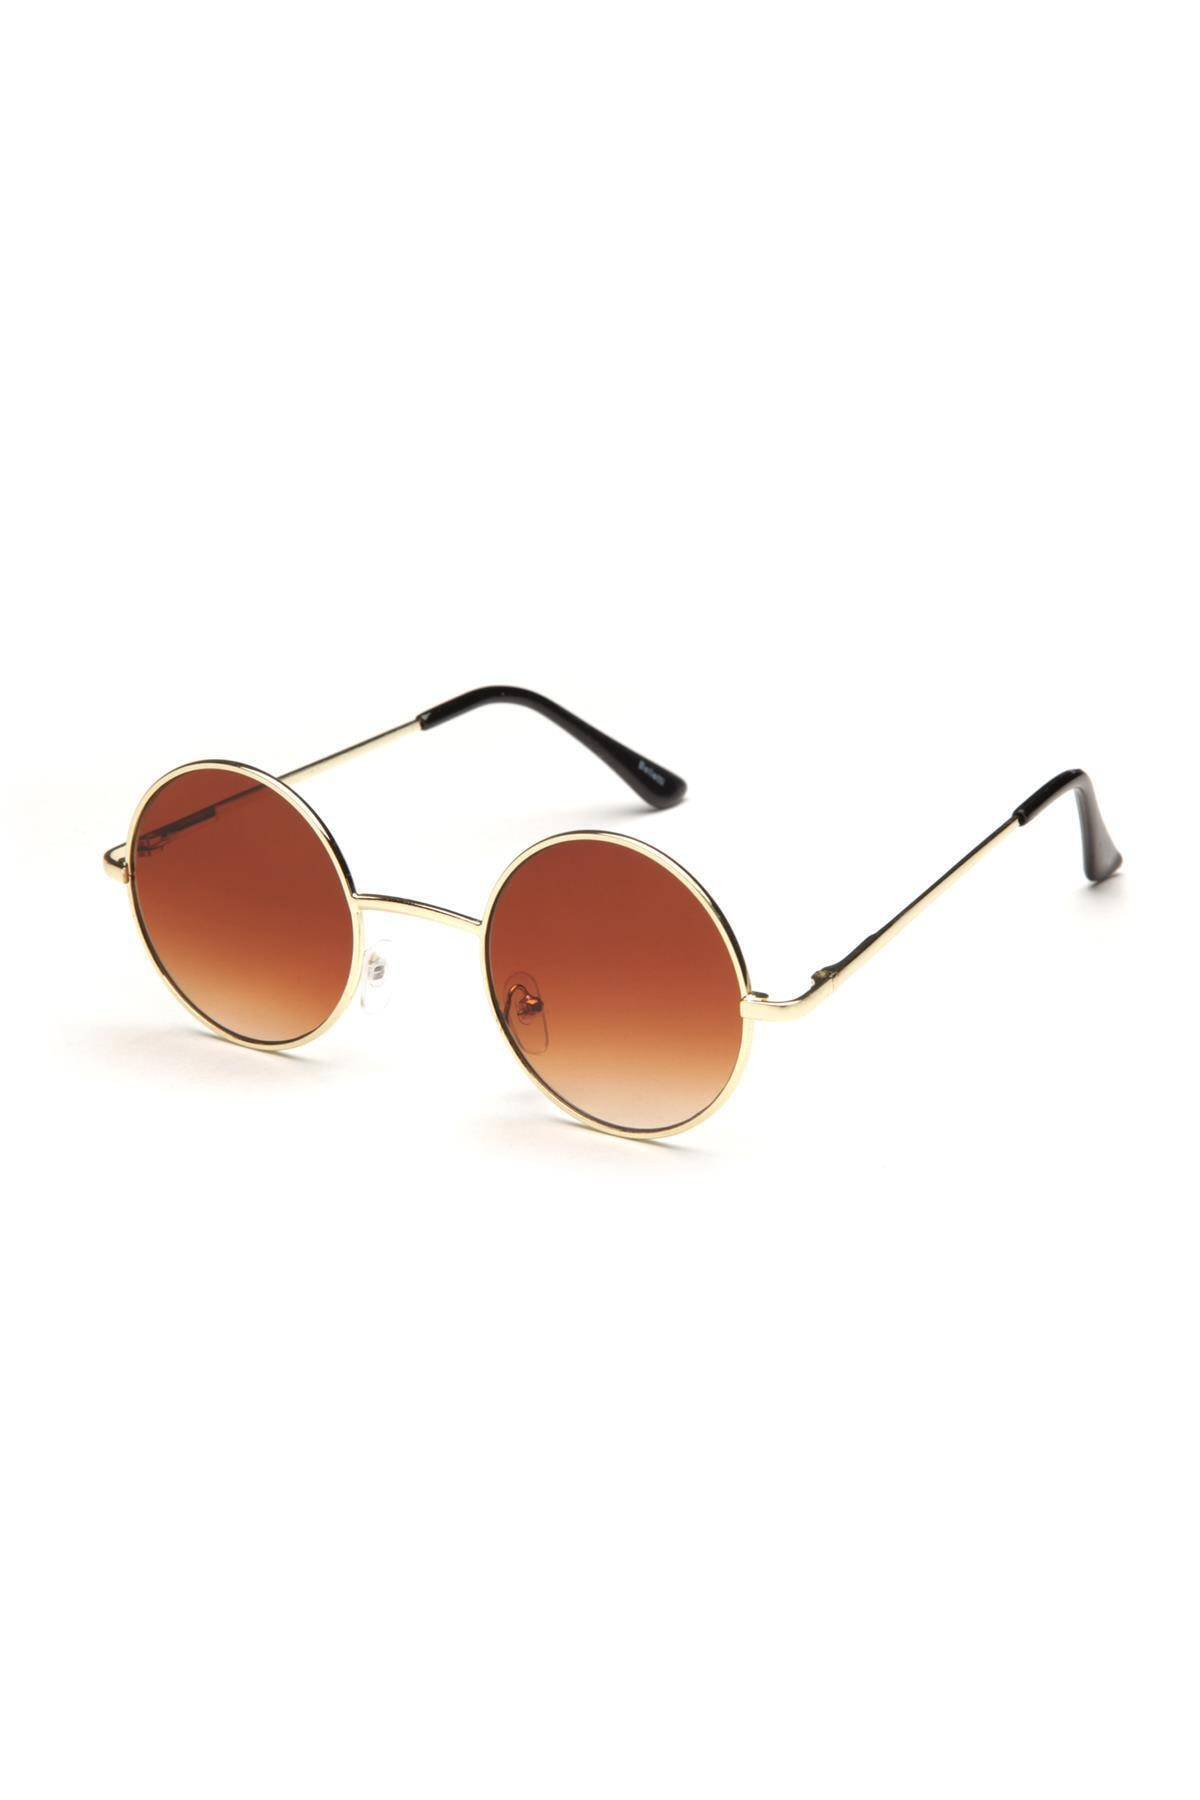 Di Caprio Unisex Güneş Gözlüğü Dh1569c 1